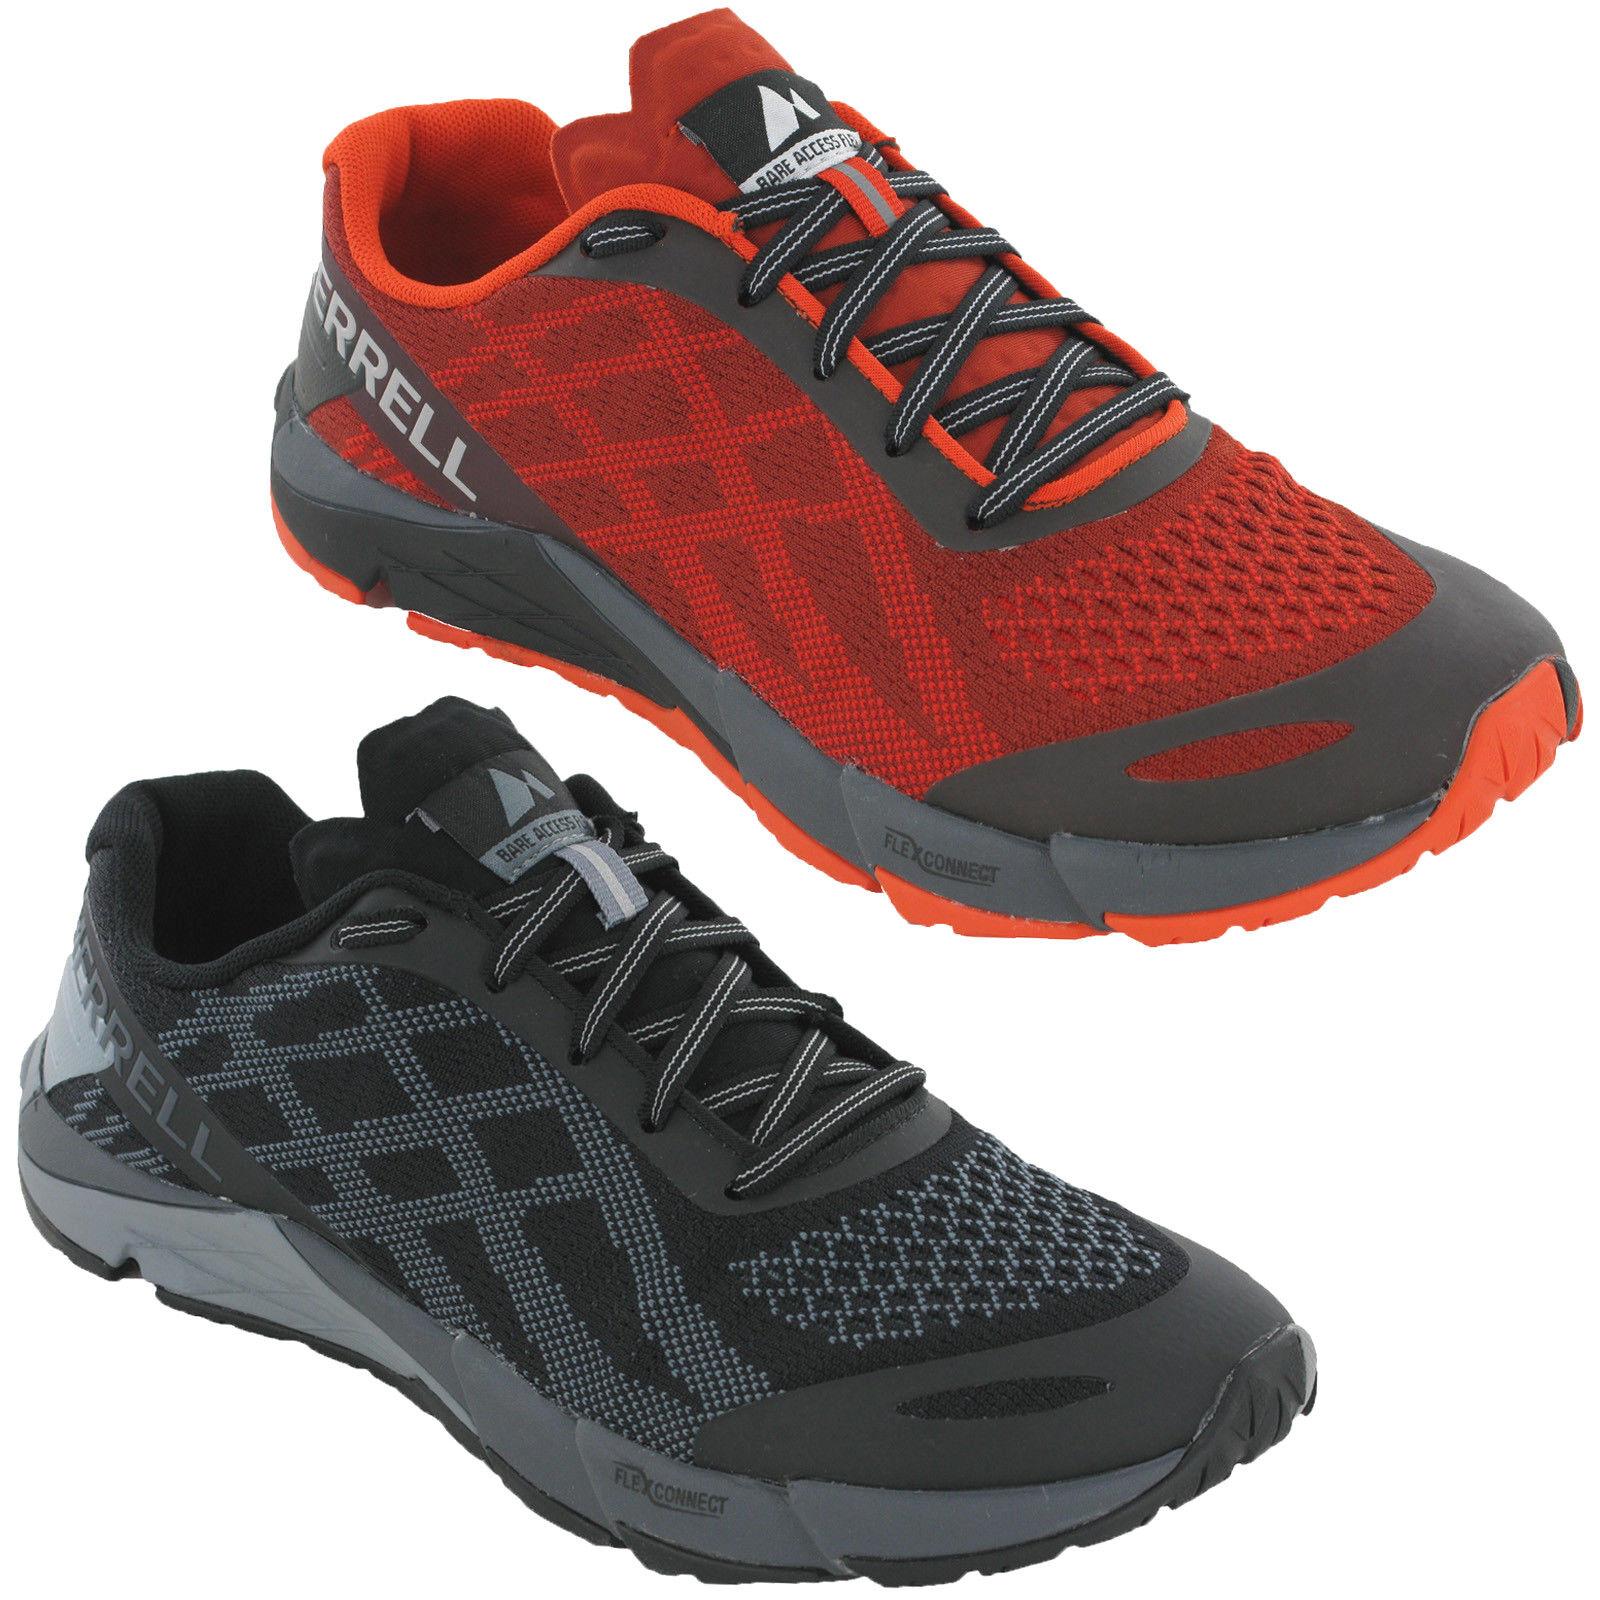 Merrell Running Bare Access Trainers Flex E-Mesh  Herren Fitness Hiking Schuhes Sport